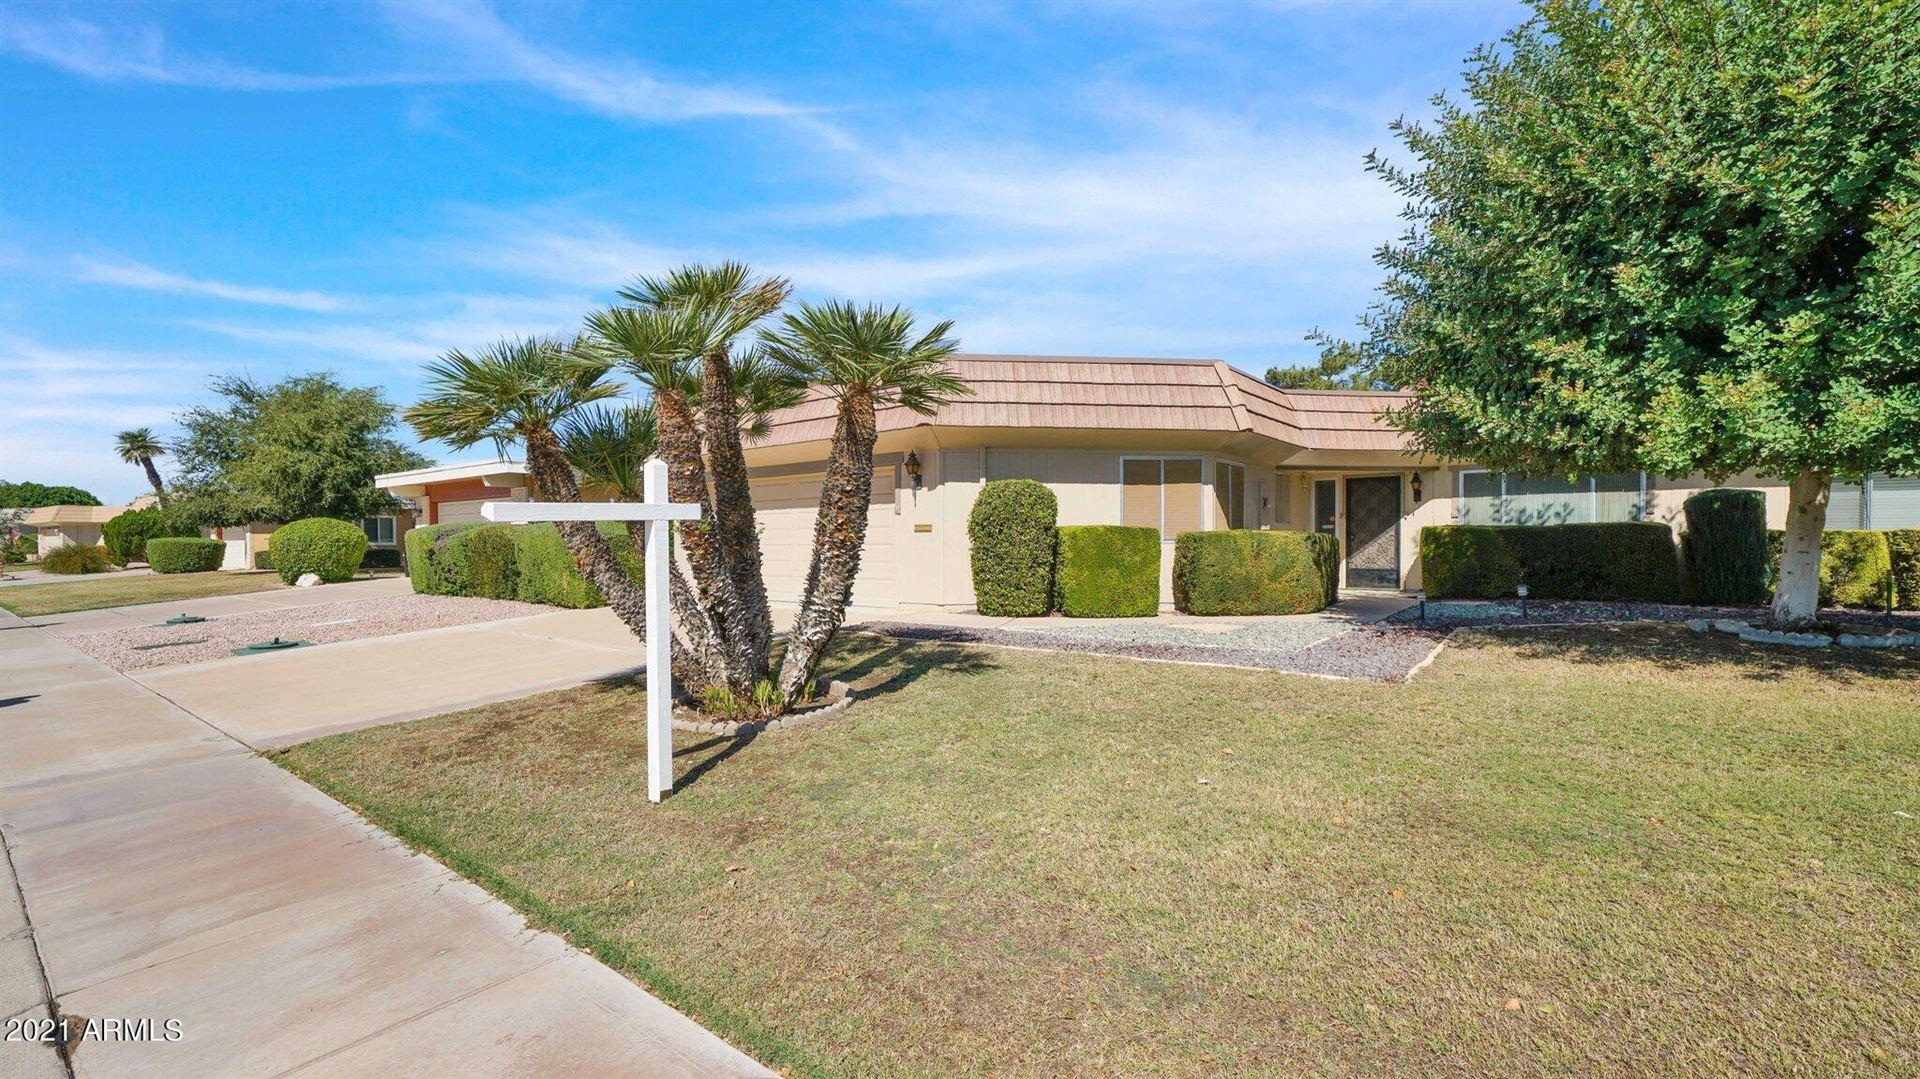 Photo of 10448 W HUTTON Drive, Sun City, AZ 85351 (MLS # 6307535)